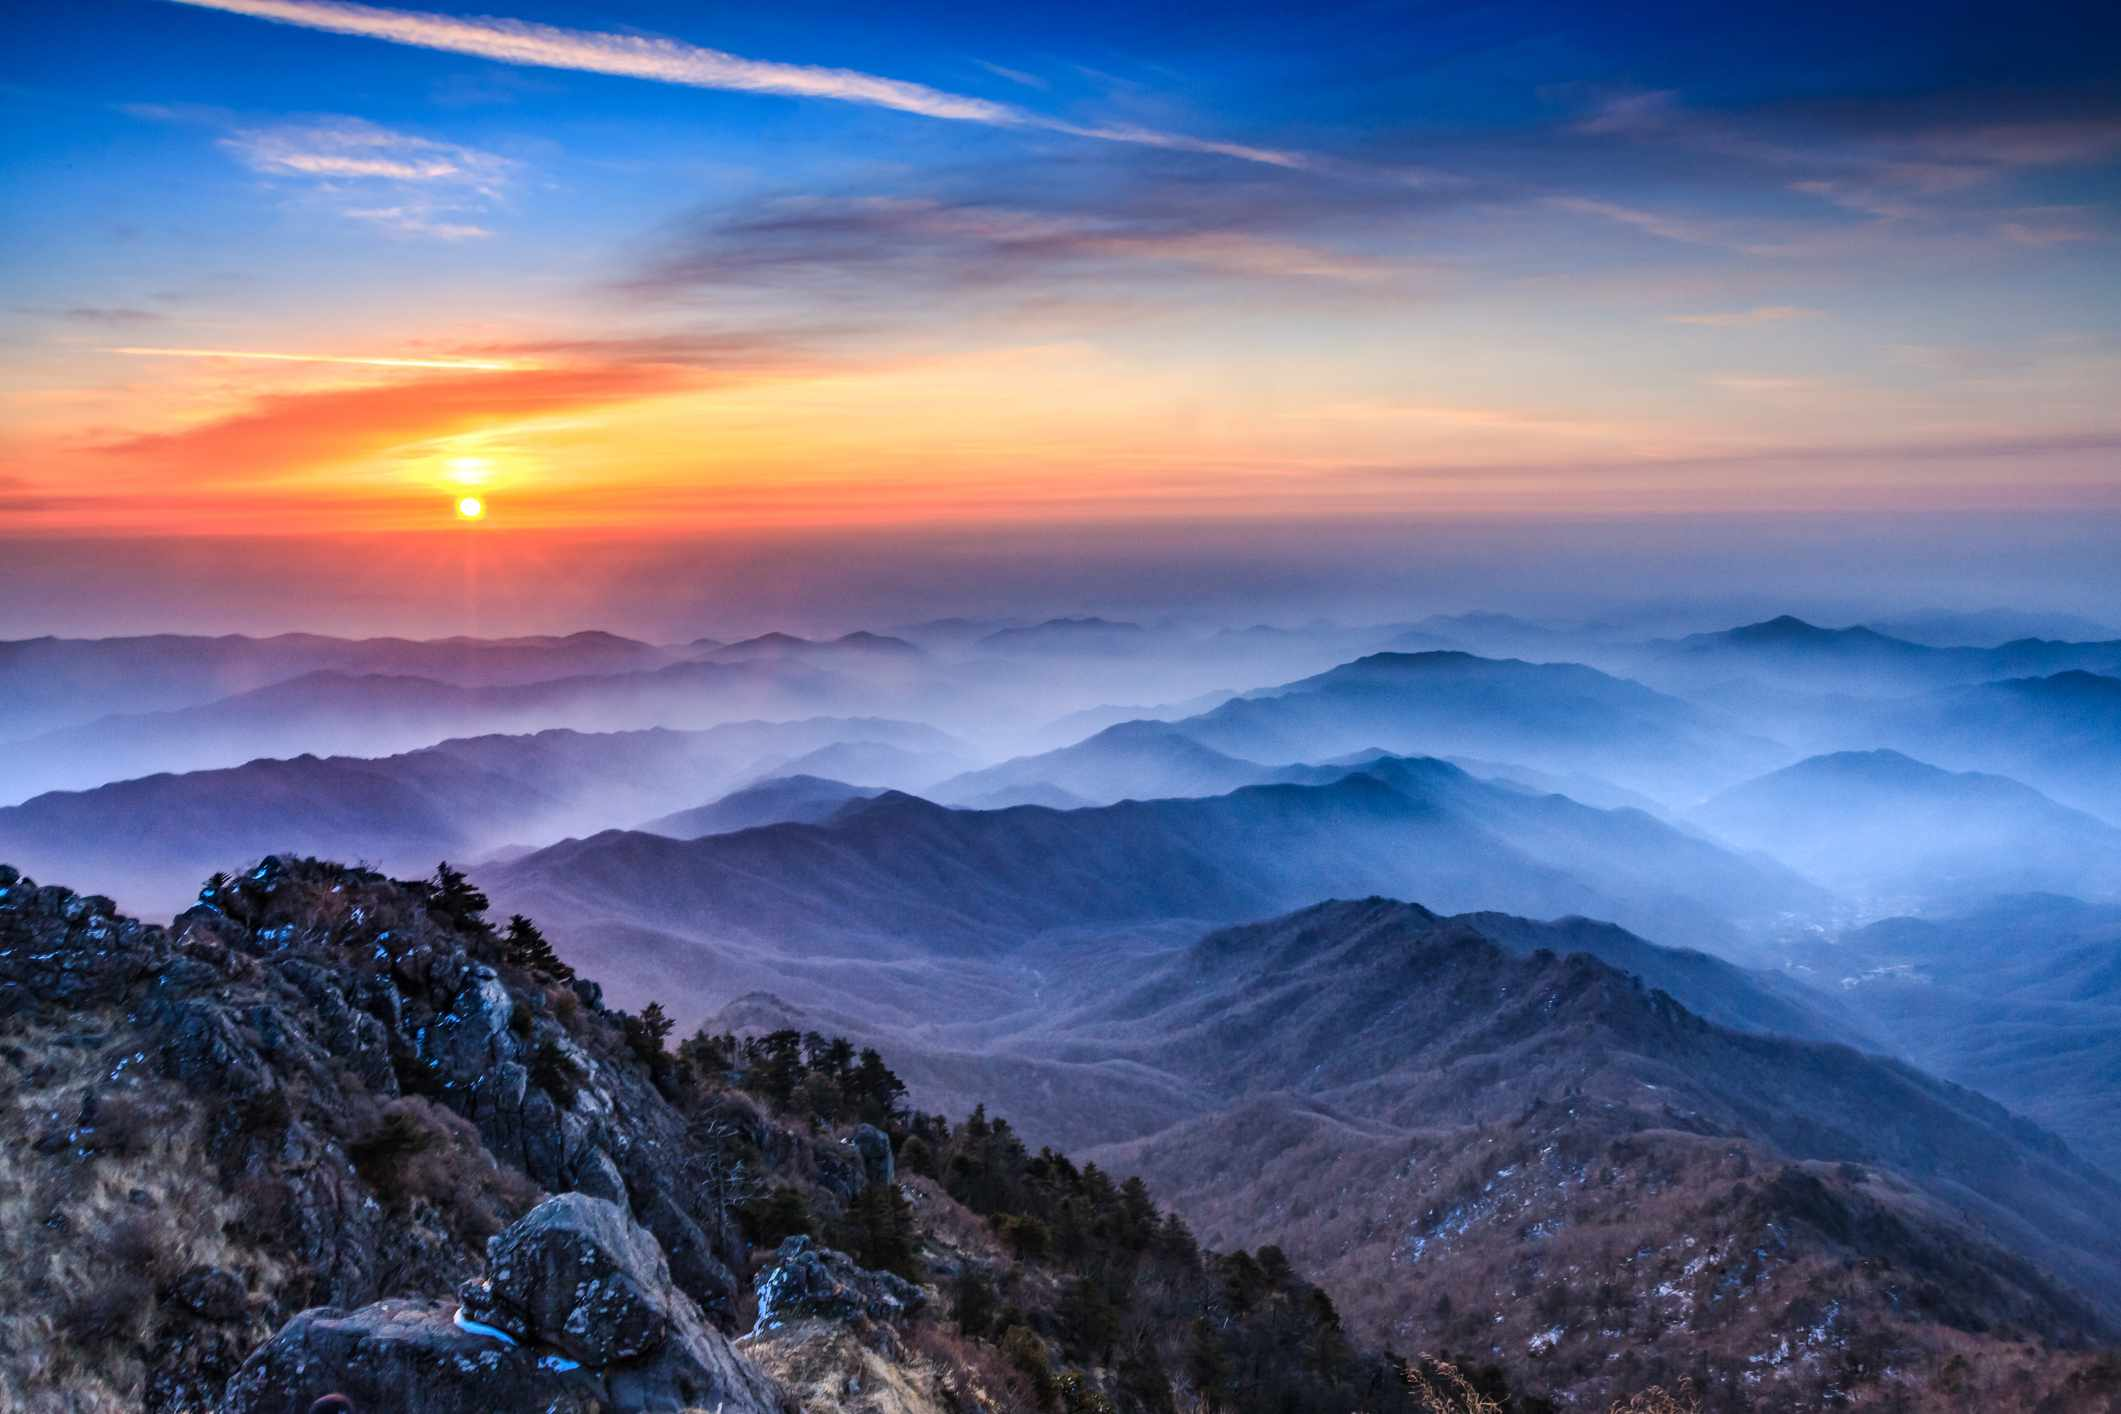 Sunrise over Jirisan National Park, South Korea